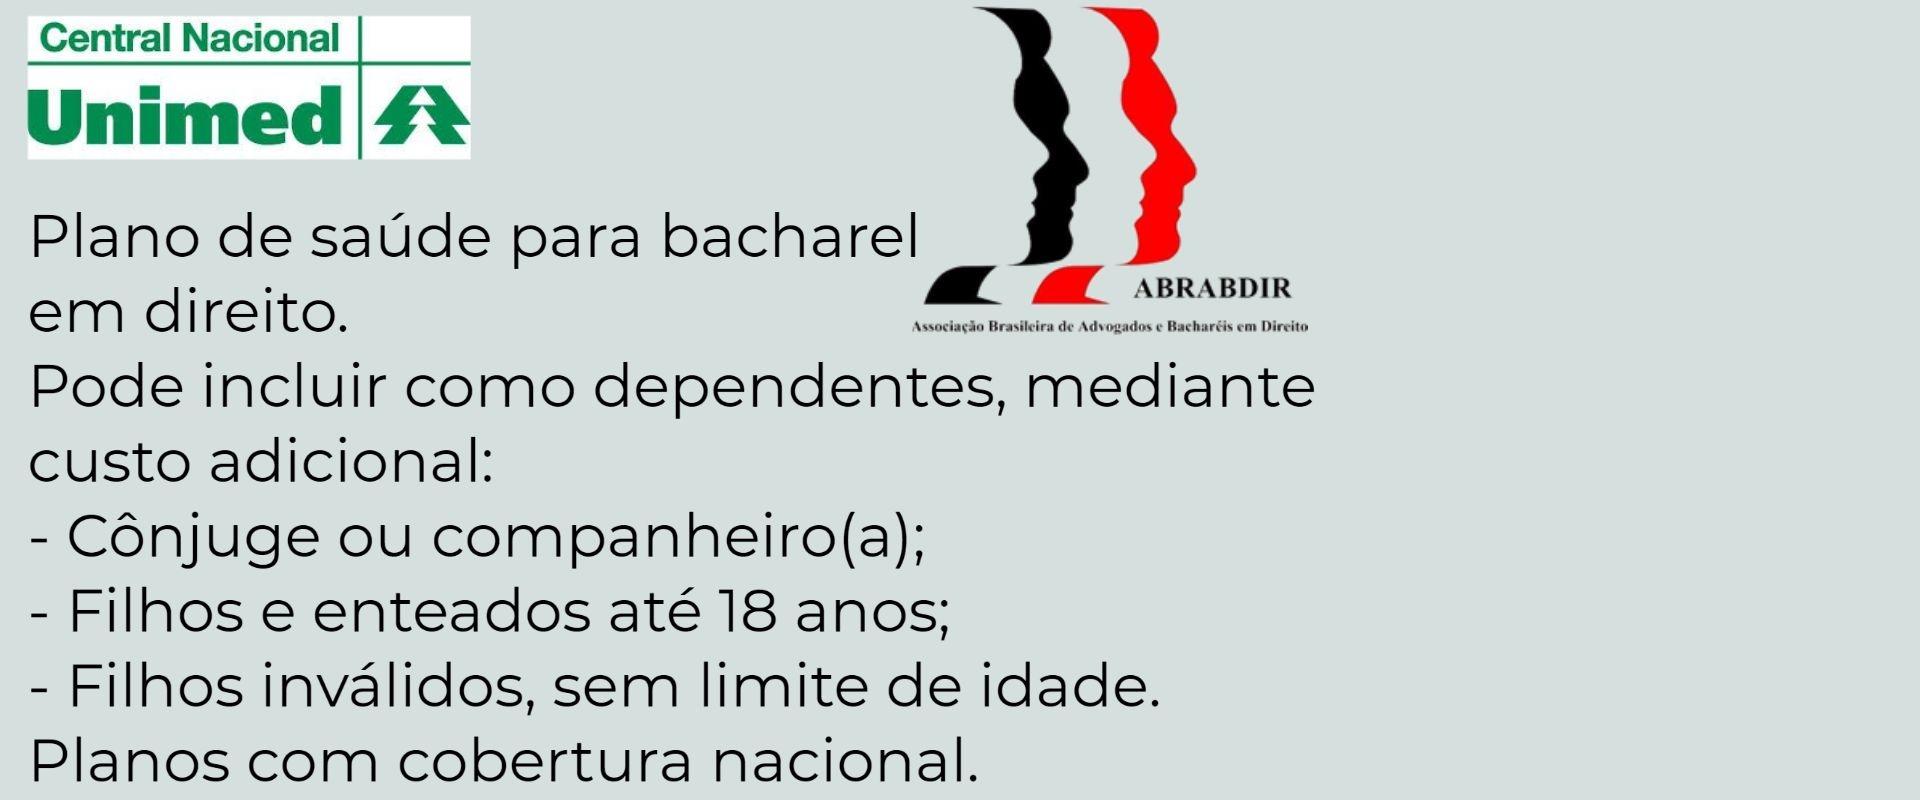 Unimed ABRABDIR Caçapava